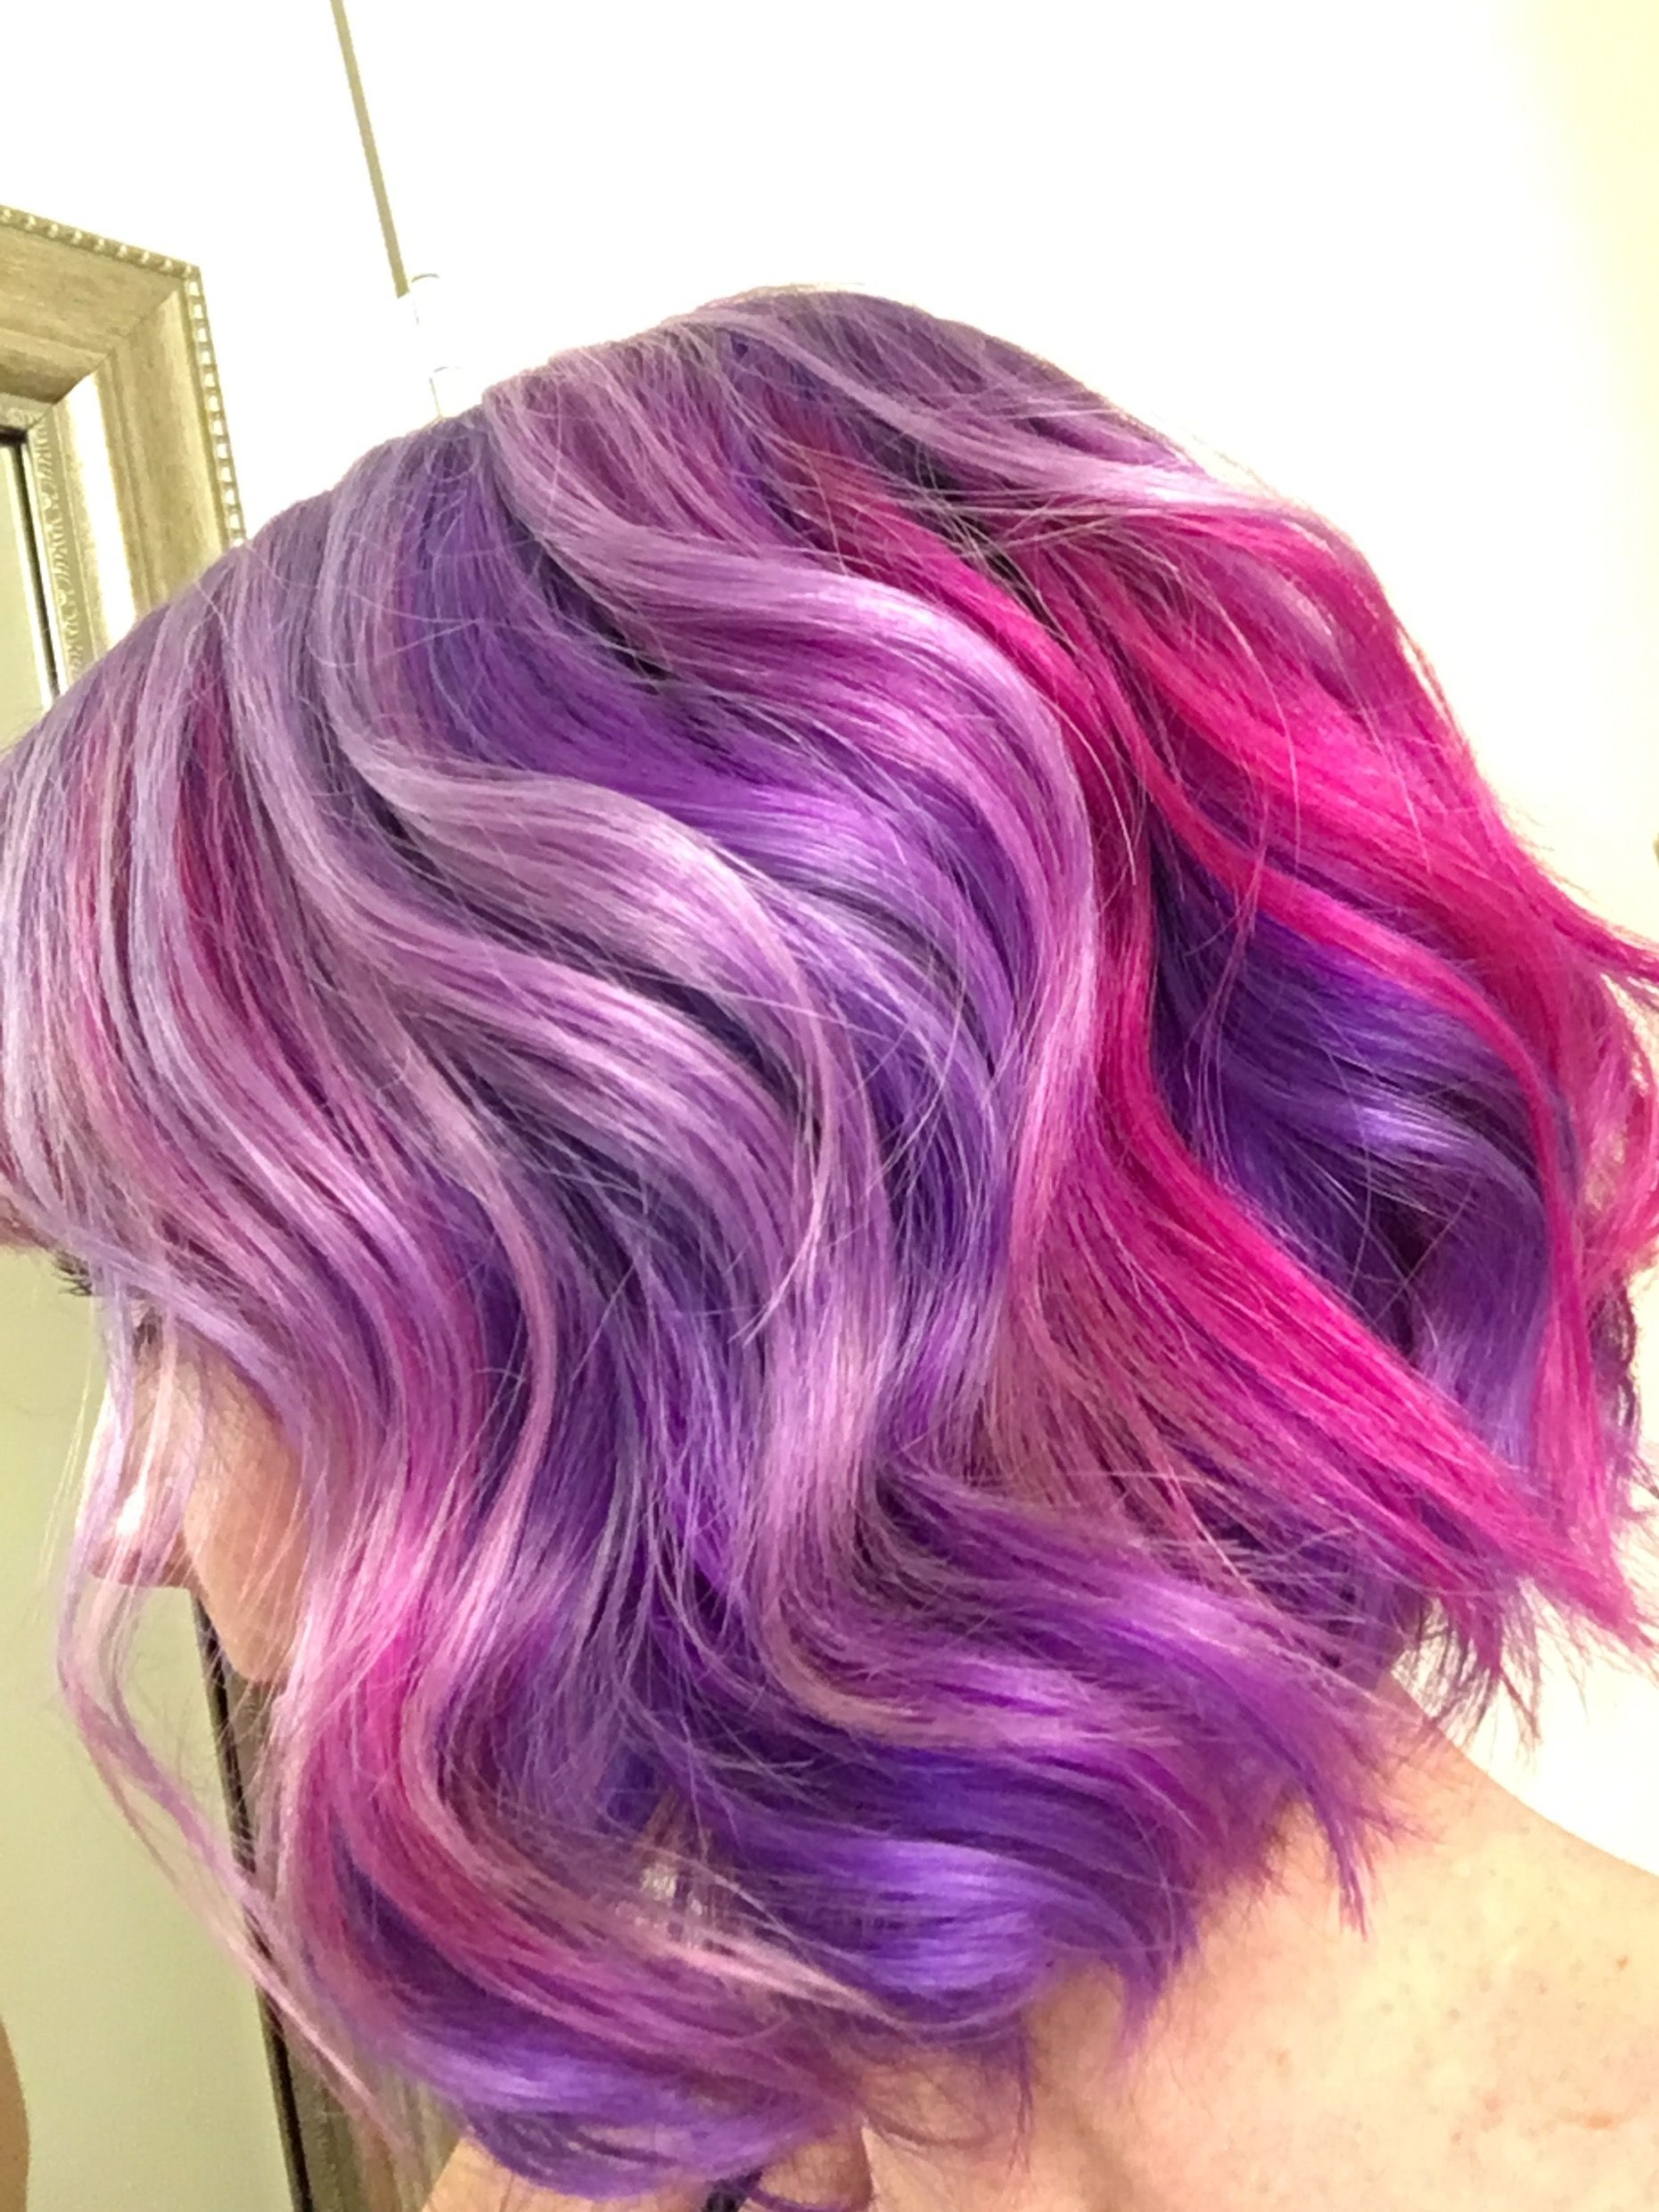 Pravana Vivid Hair Color By Arianna Genini